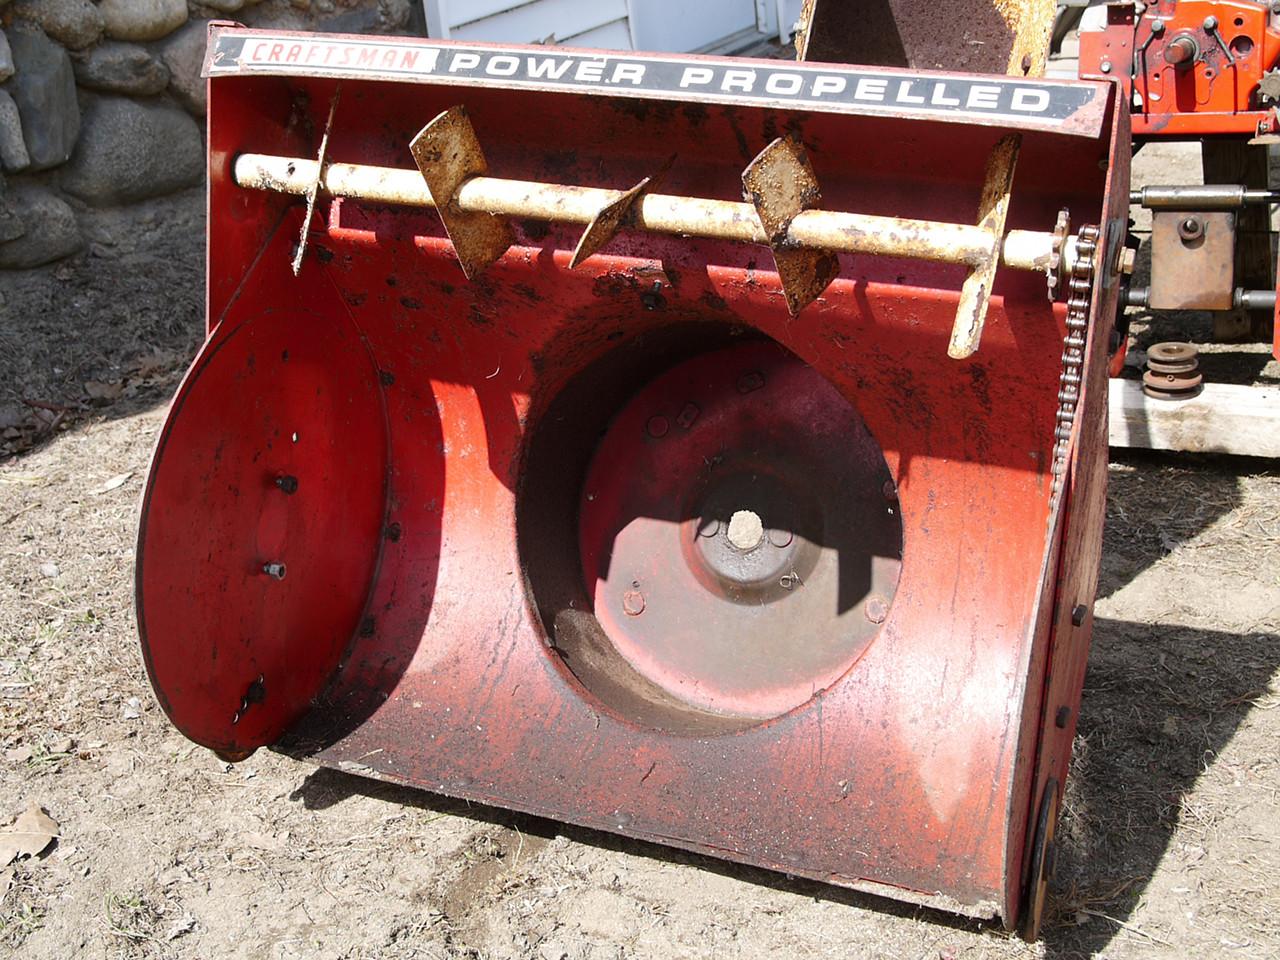 Craftsman 536.906100 'Transitional' Drift Breaker-p1050060.jpg